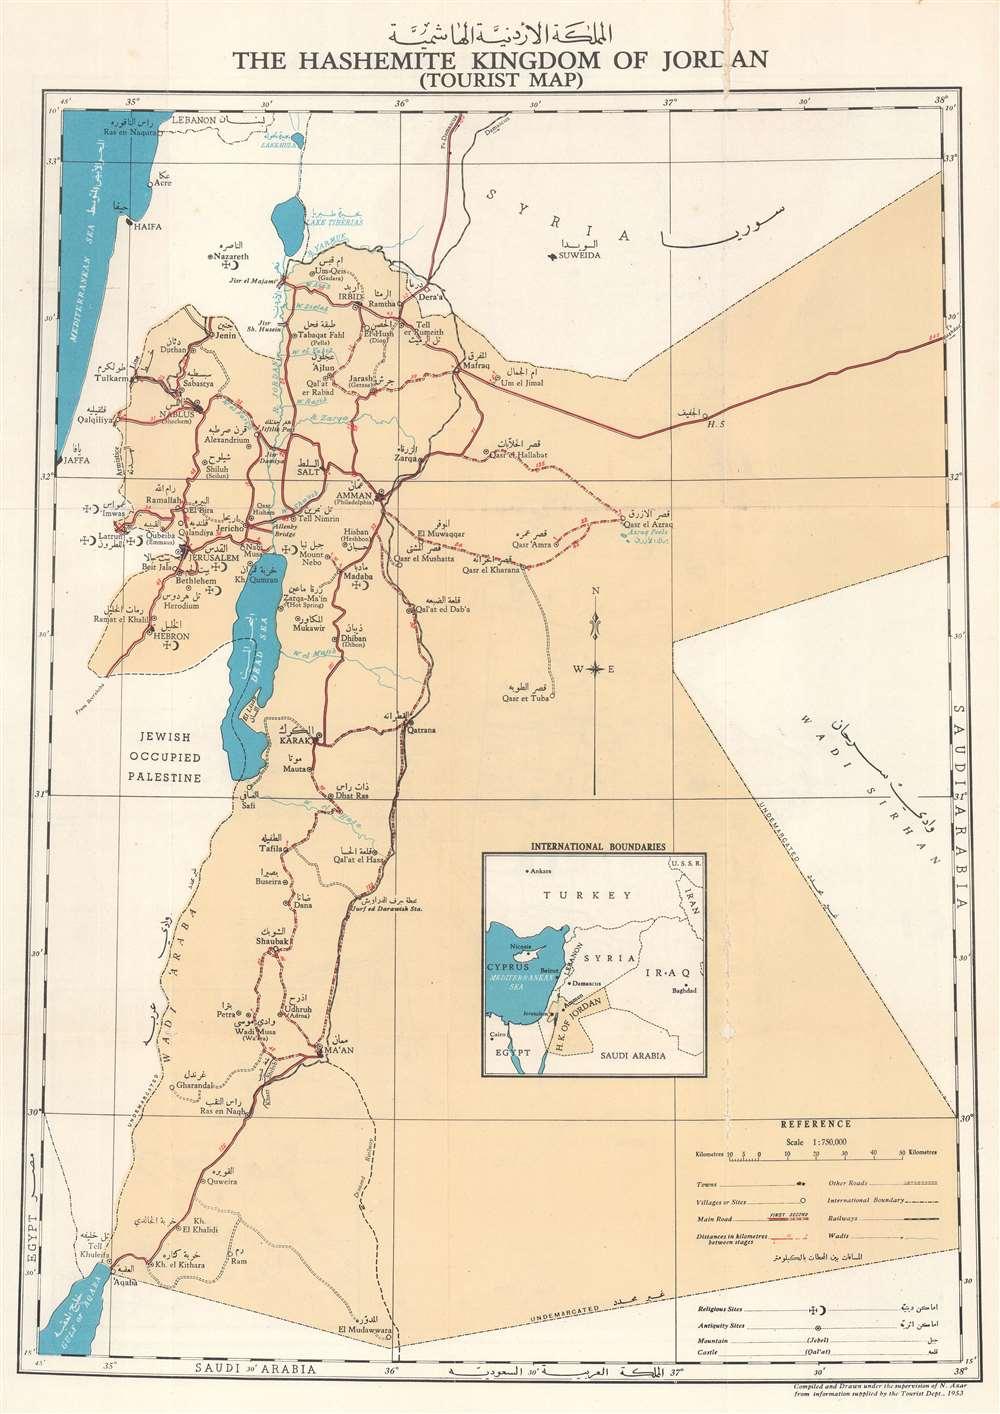 1955 Azar Tourist Map of the Hashemite Kingdom of Jordan